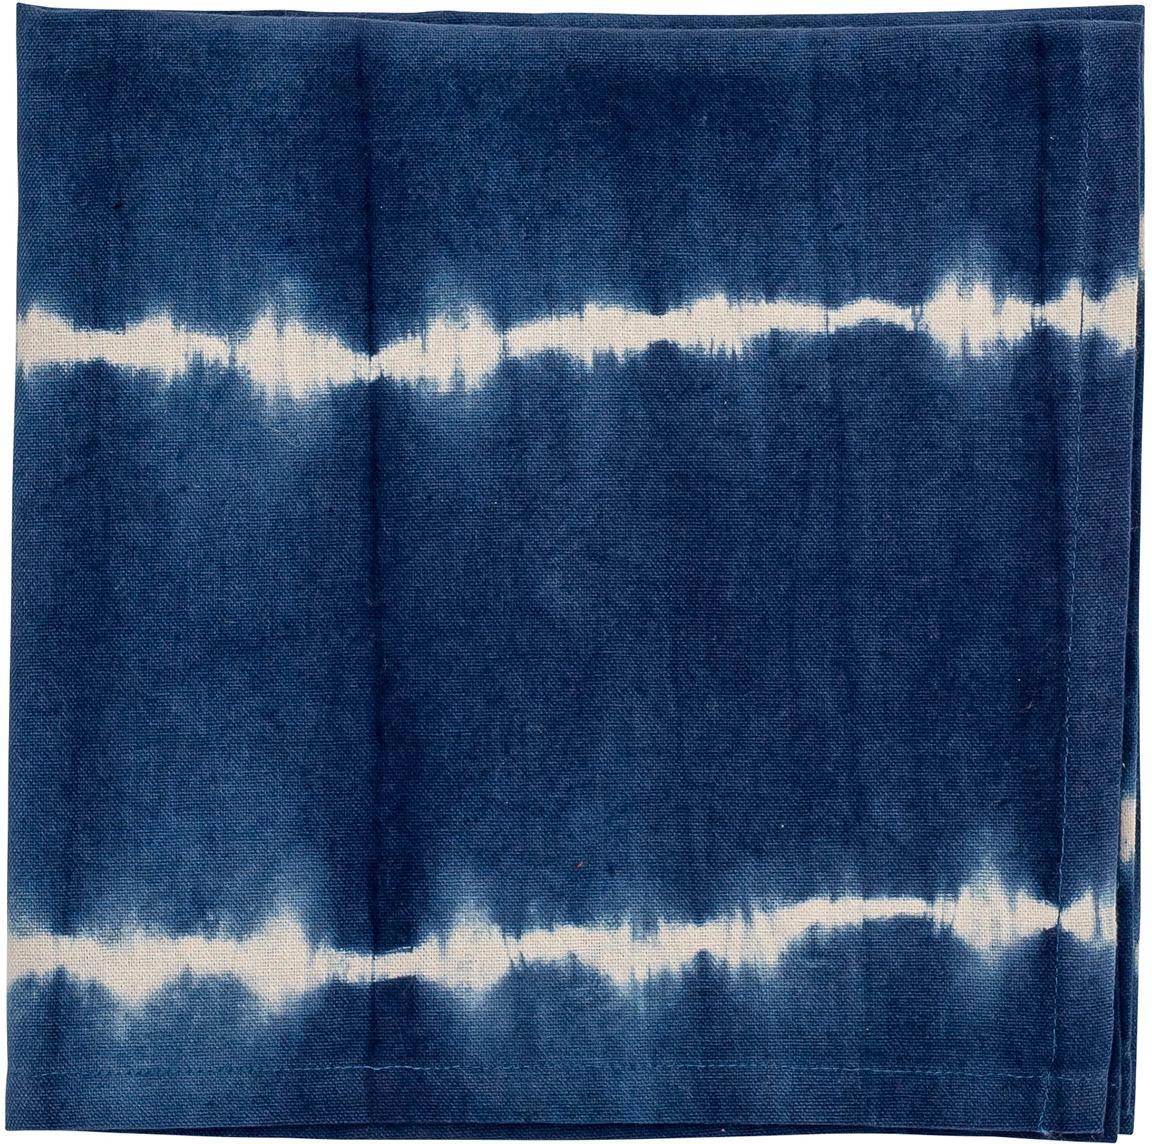 Servilletas de algodón Alden 4uds., 100%algodón, Azul, An 45 x L 45 cm